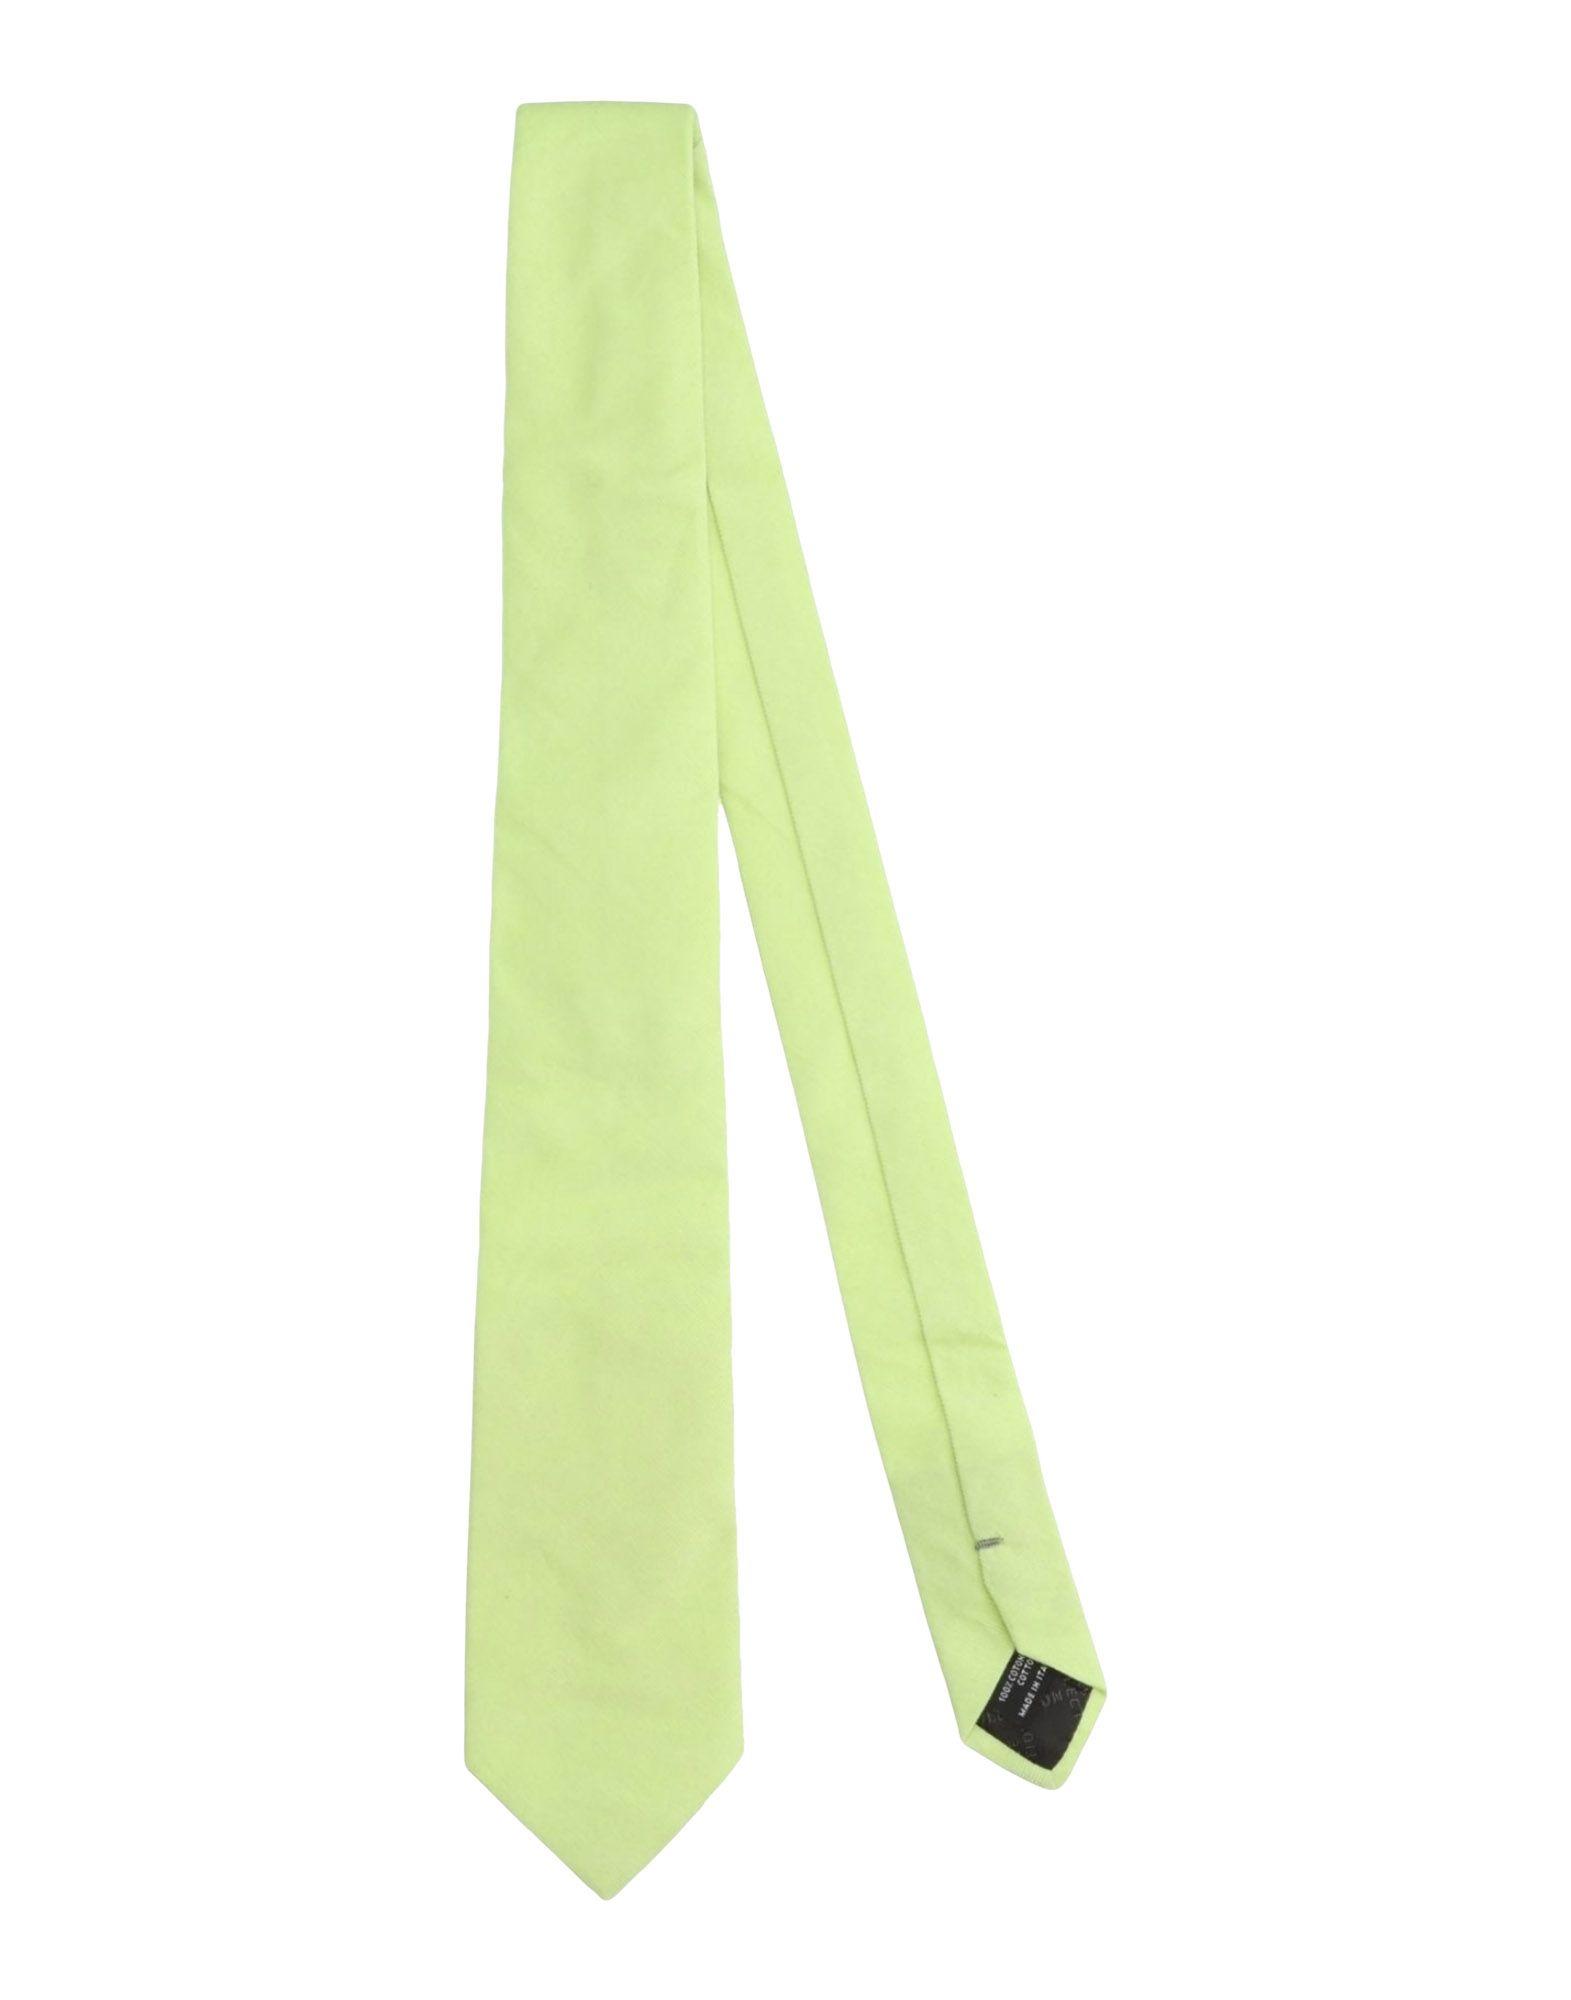 VERSACE COLLECTION Галстук versace бордовый галстук в клетку внизу с логотипом versace 821752 href